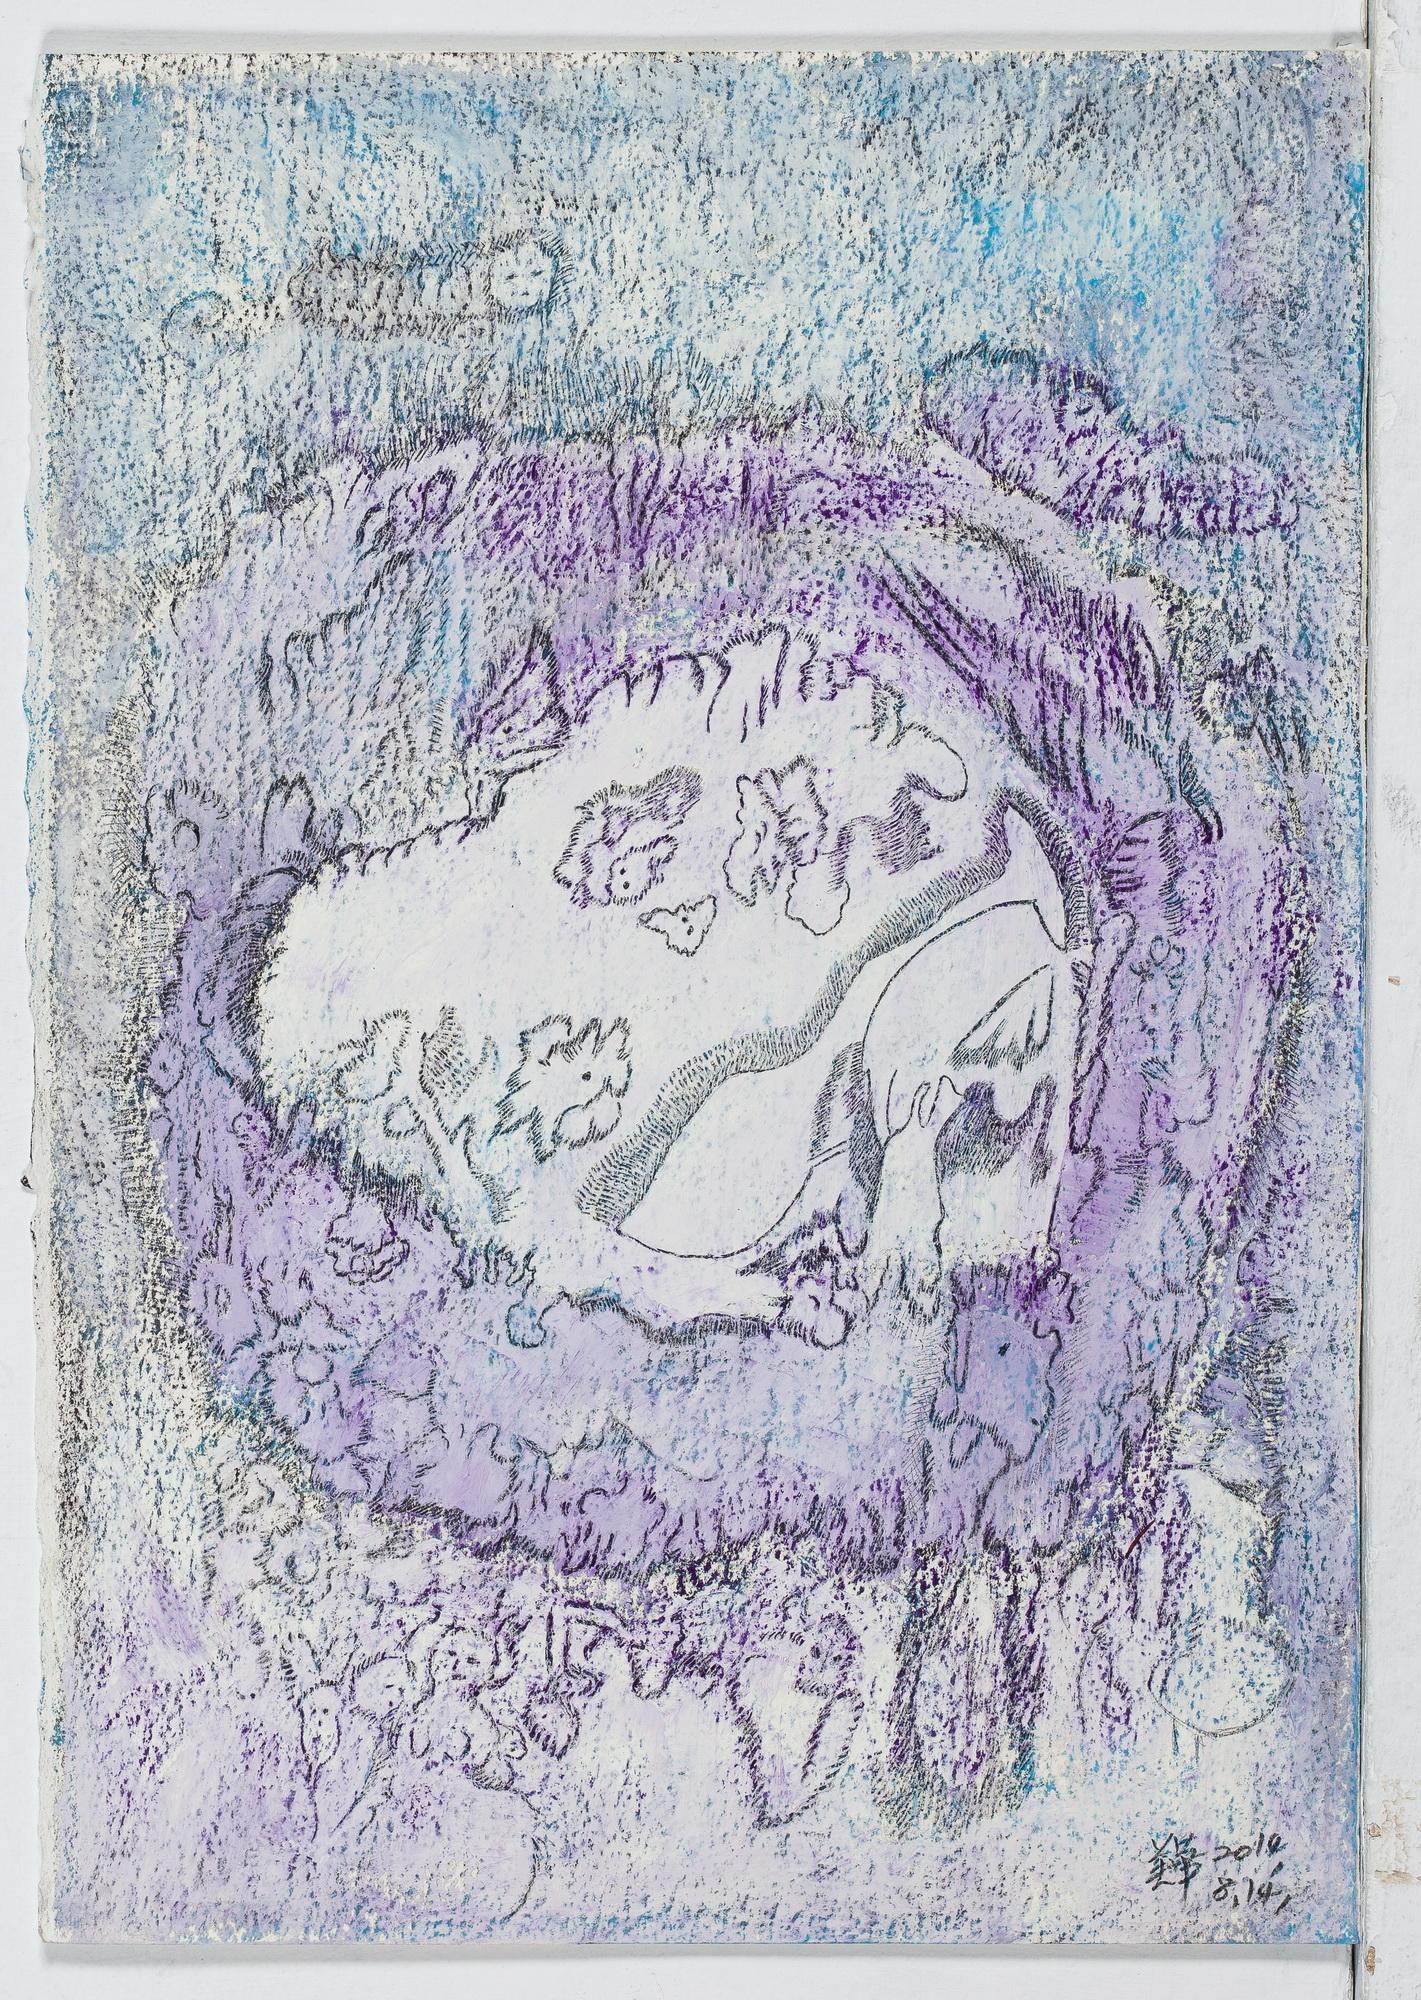 A327 水珠6  紙.鉛筆.粉彩 油彩28X39.5 2014-8